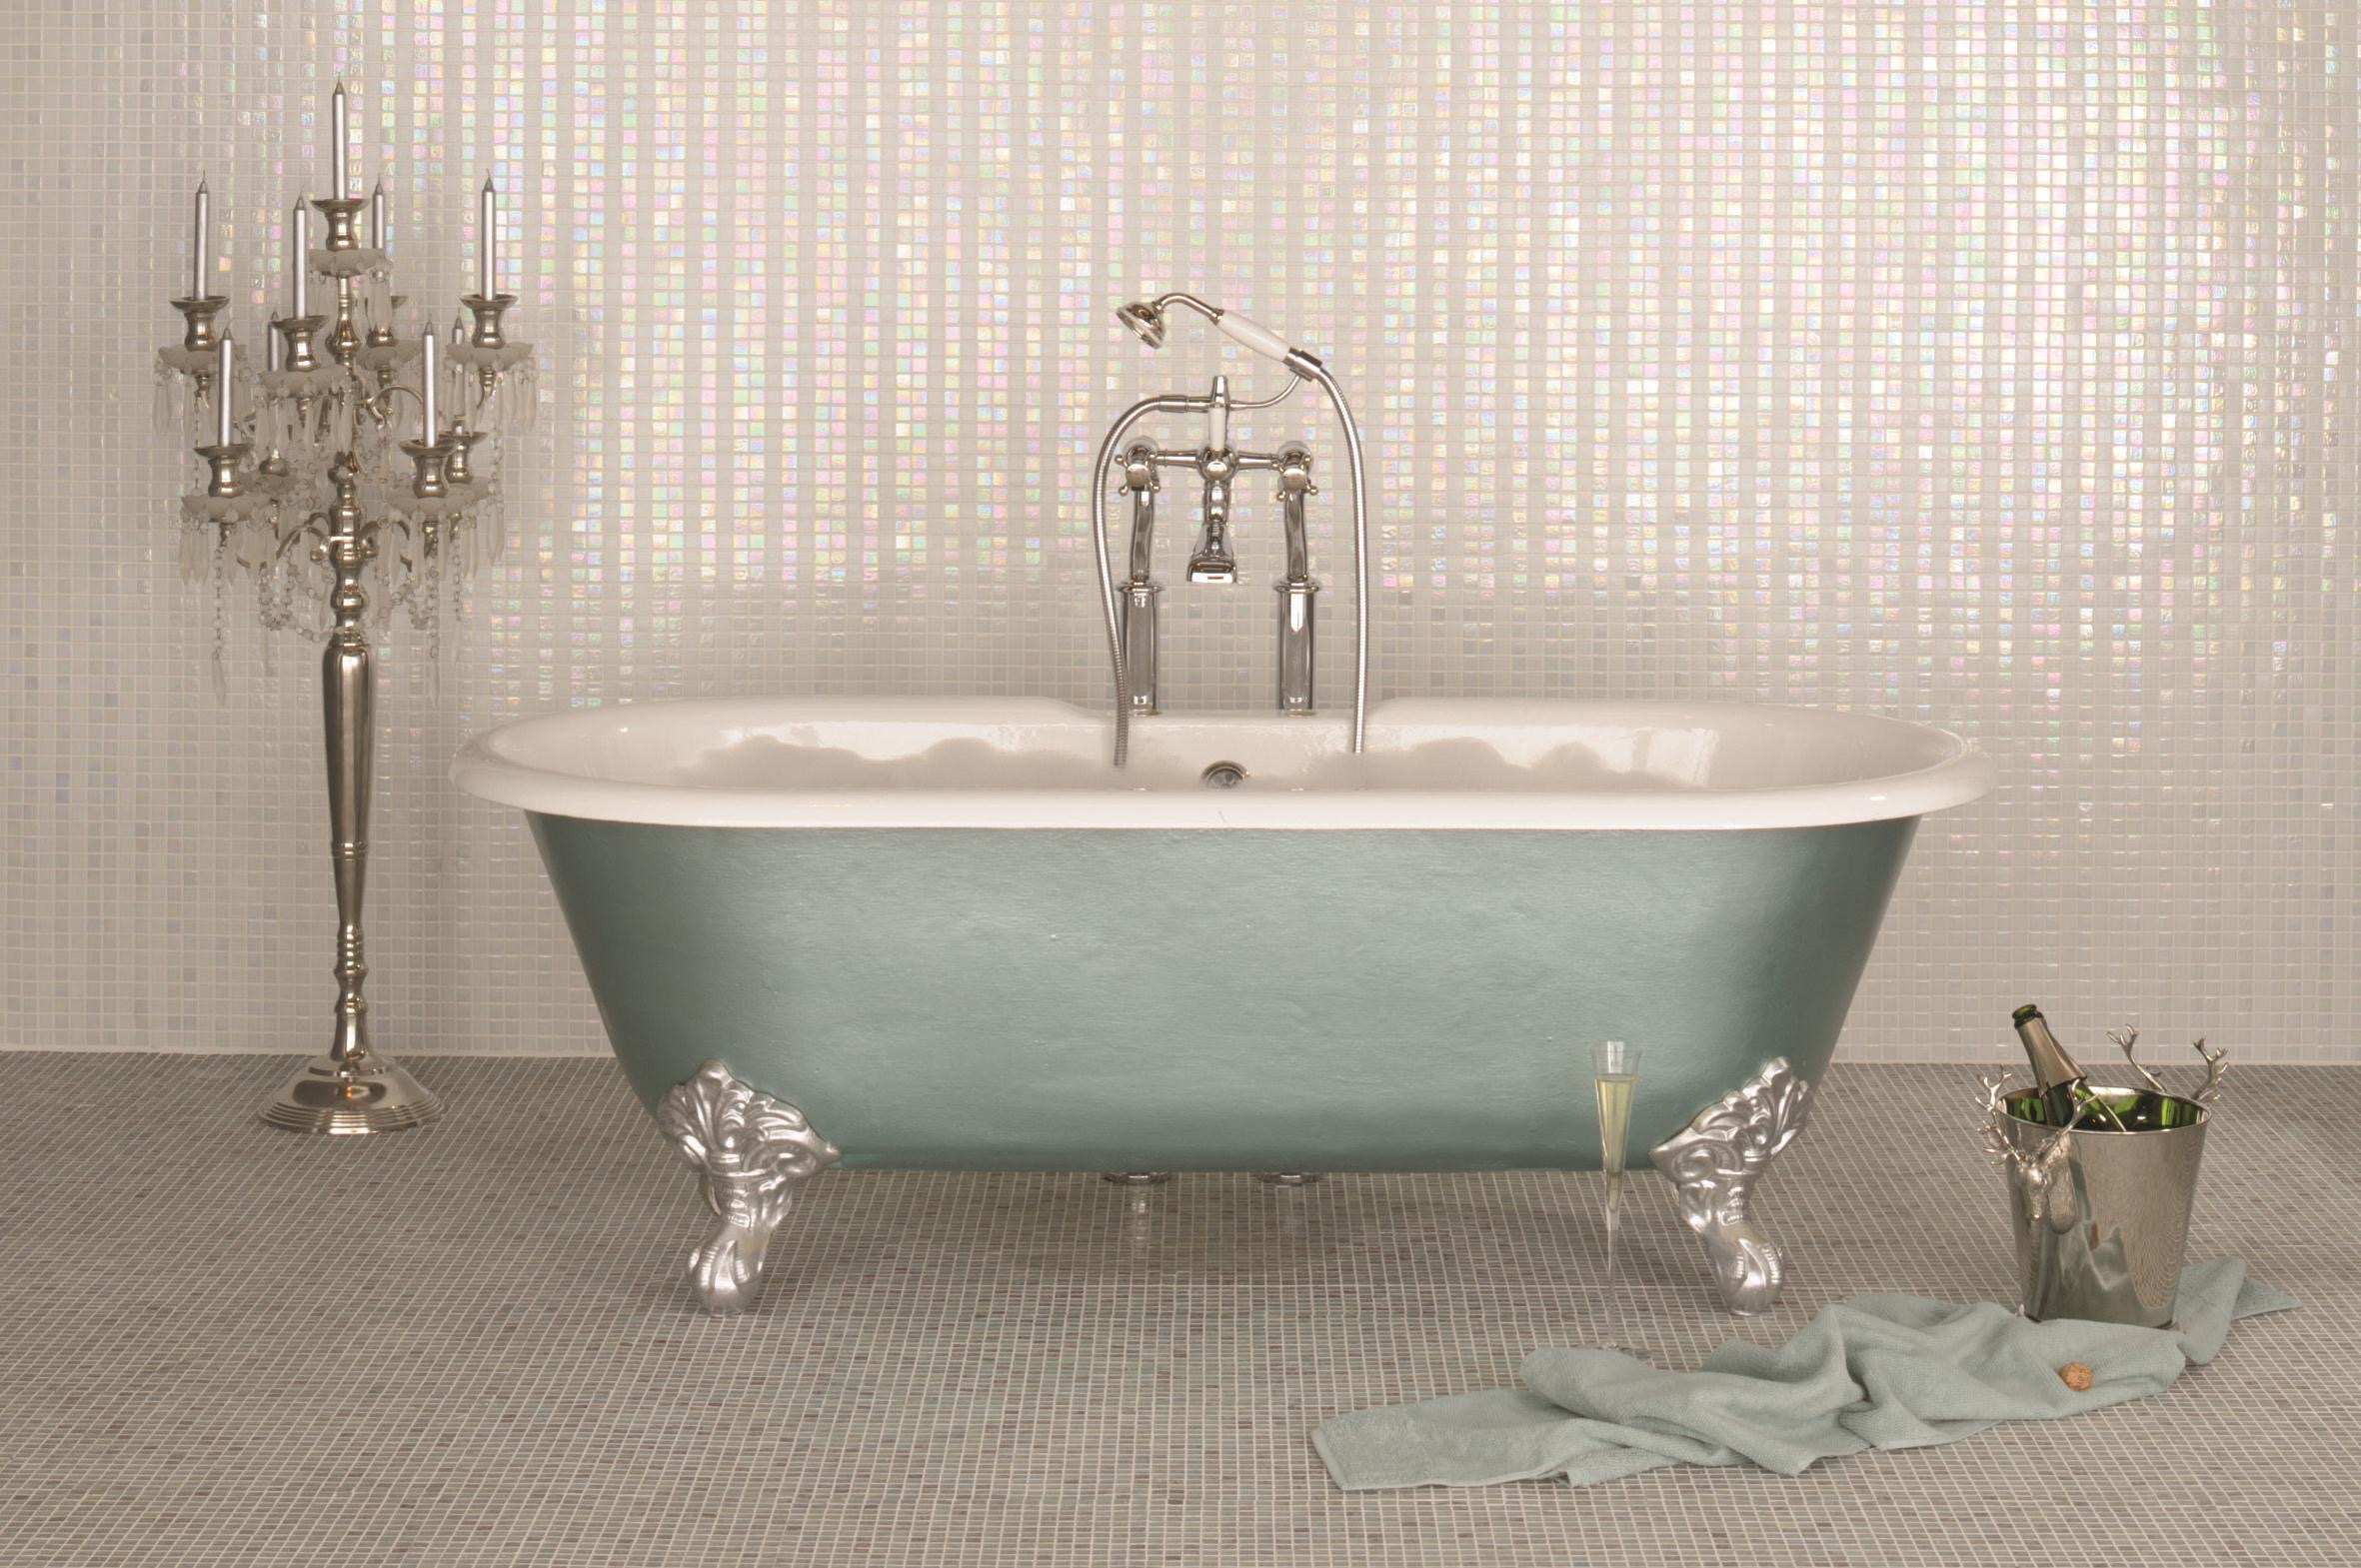 Original Style_Mosaics_GW-TPOMOS Taupo stripe with GW-KSMPMOS kashoto matt floor, bath shoot.jpg